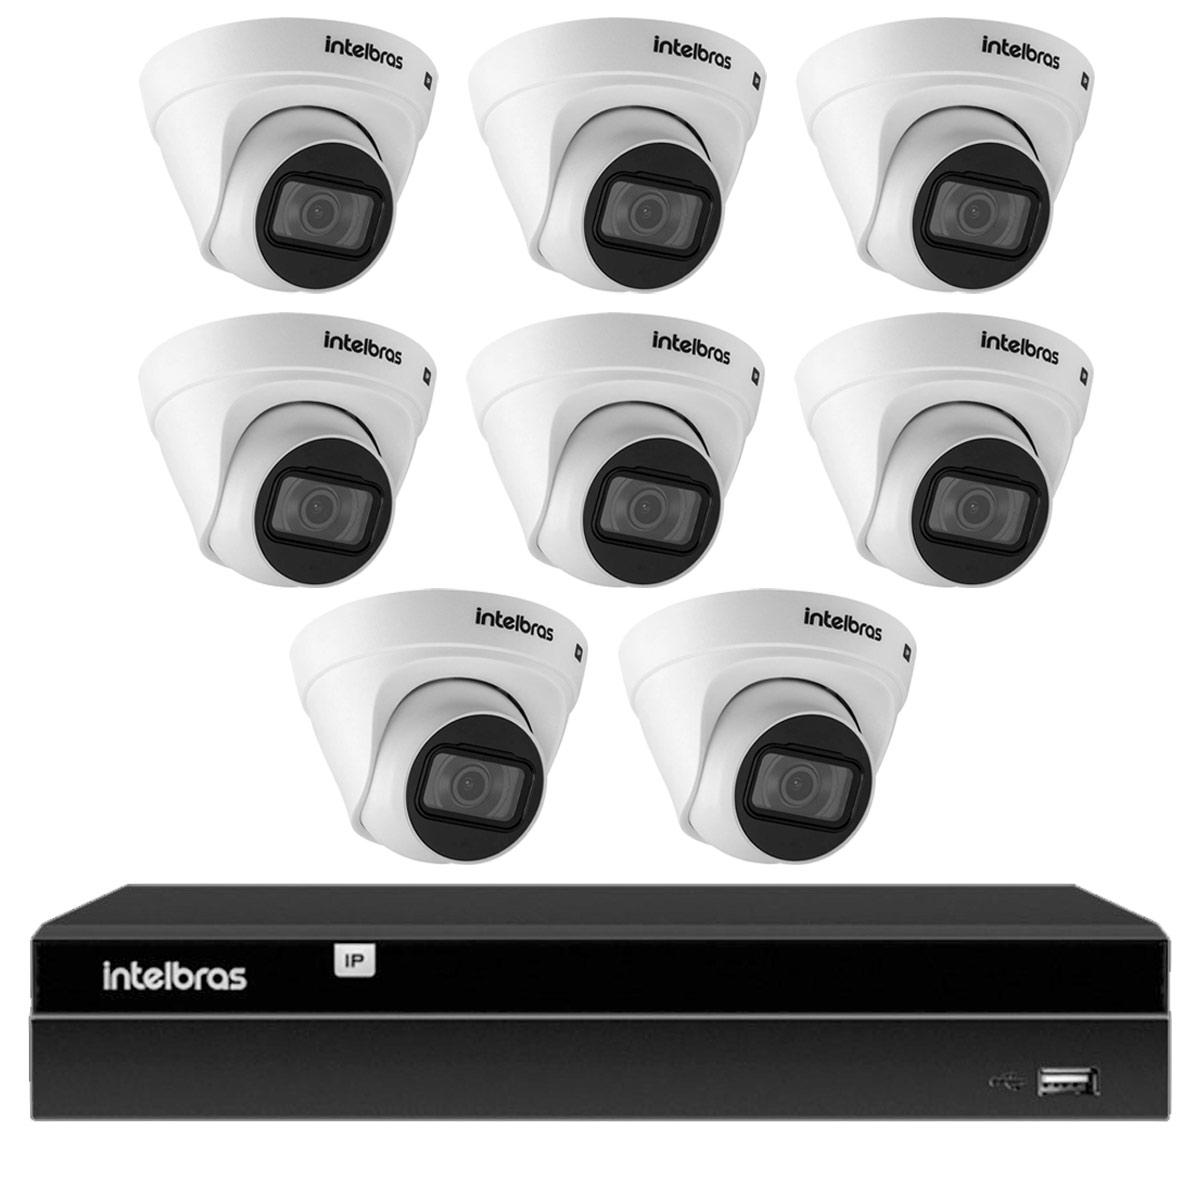 kit-6-cameras-vip-1020-d-g2-nvr-intelbras-app-gratis-de-monitoramento-cameras-hd-720p-20m-infravermelho-de-visao-noturna-intelbras